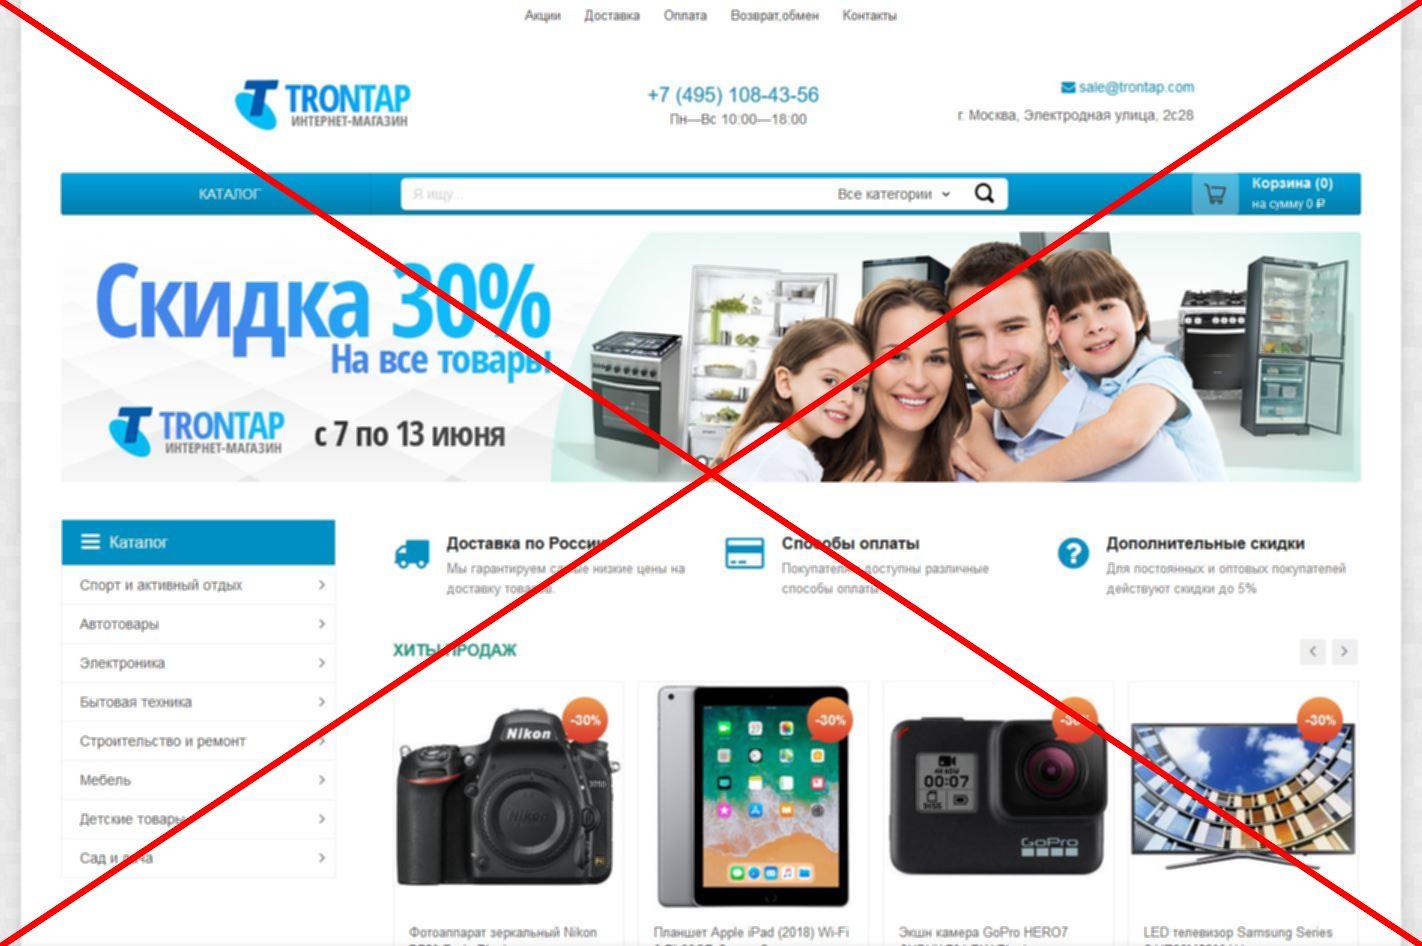 Скрин trontap.com и caylott.ru